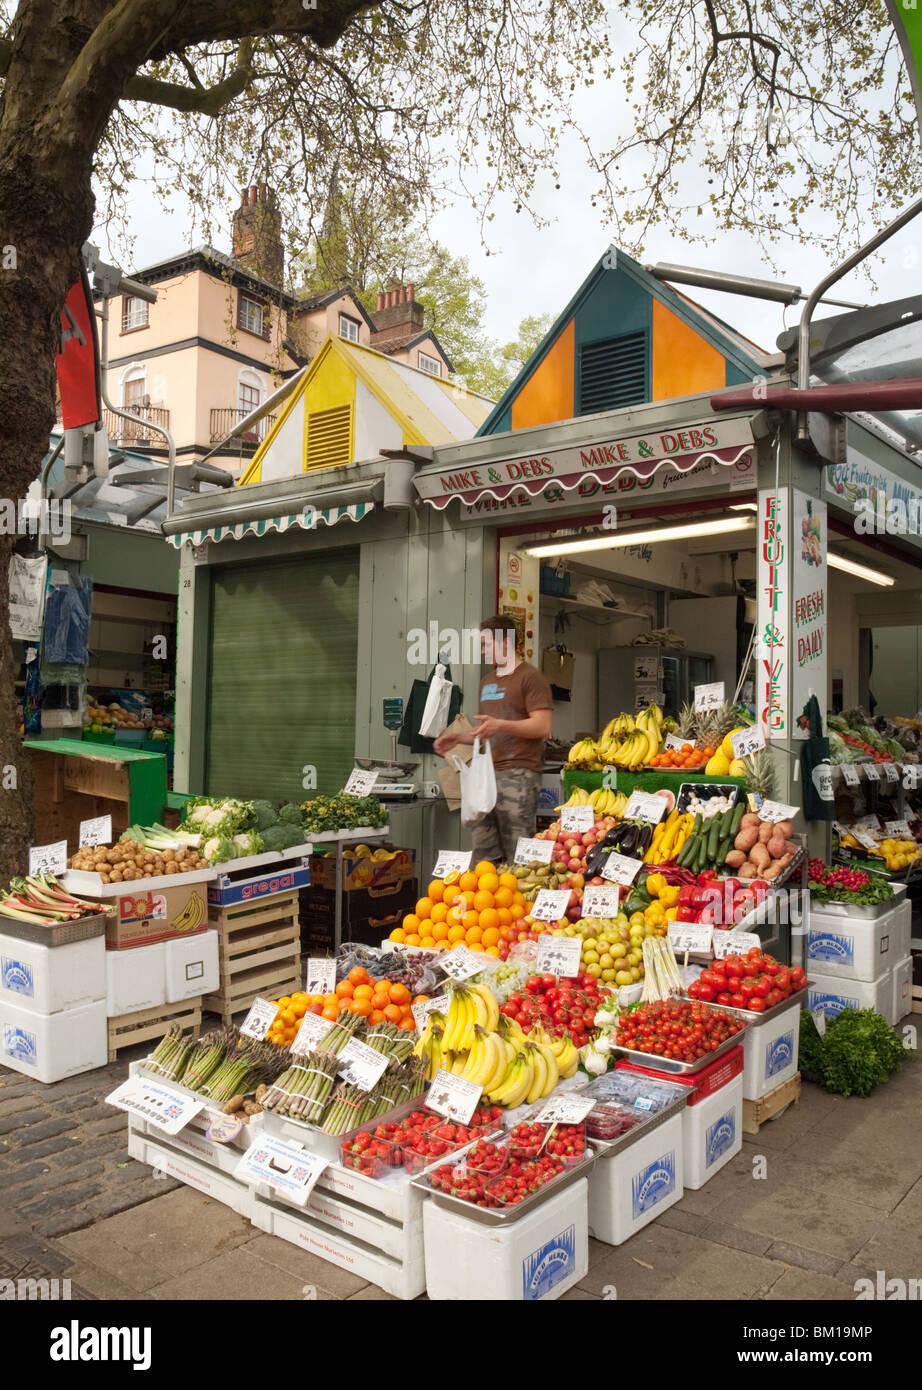 Fruit and veg stall, Norwich market, Norwich, Norfolk, UK - Stock Image